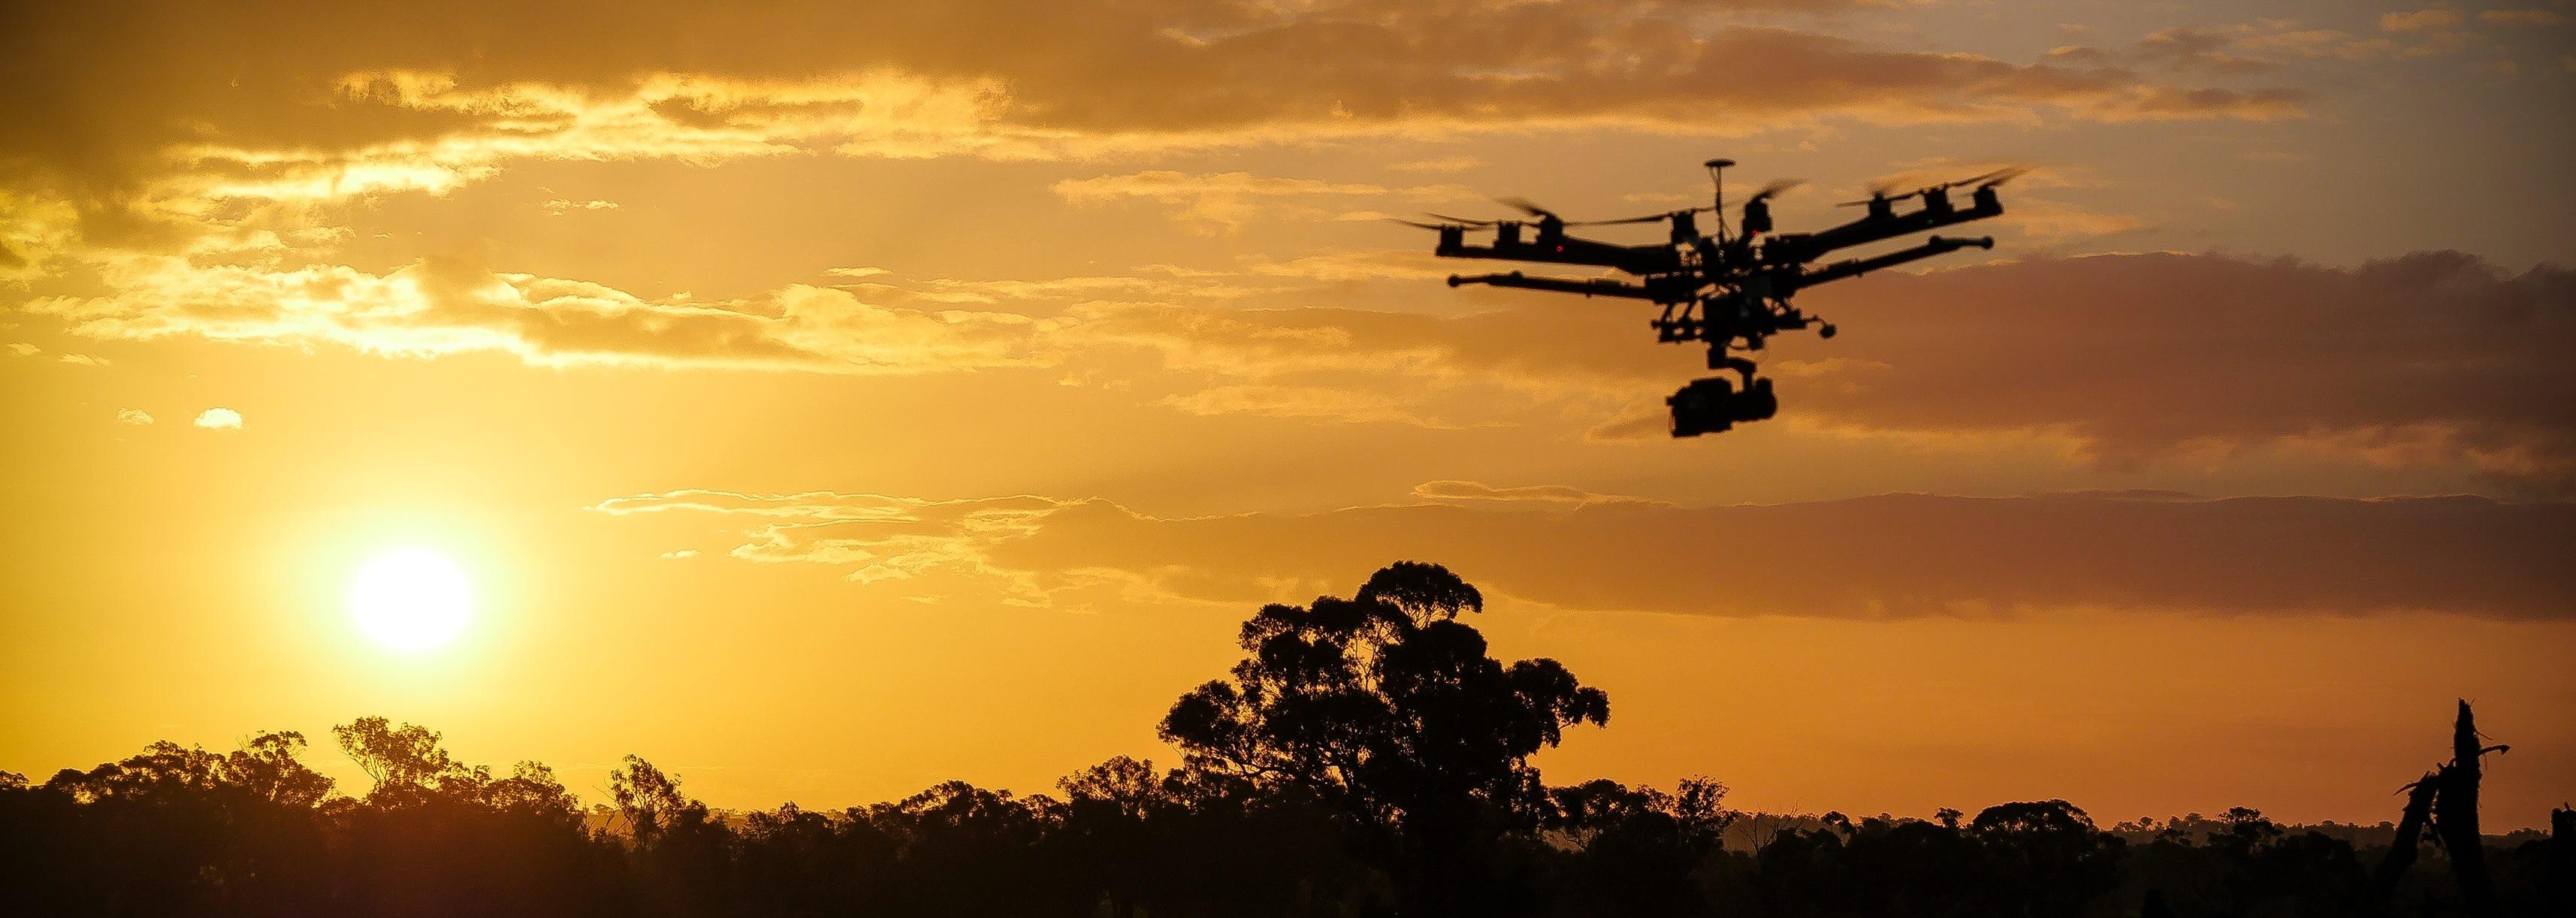 Wallpaper Dji Spreading Wings S1000 Plus Octocopter Best Drones Sunset Hi Tech 13285